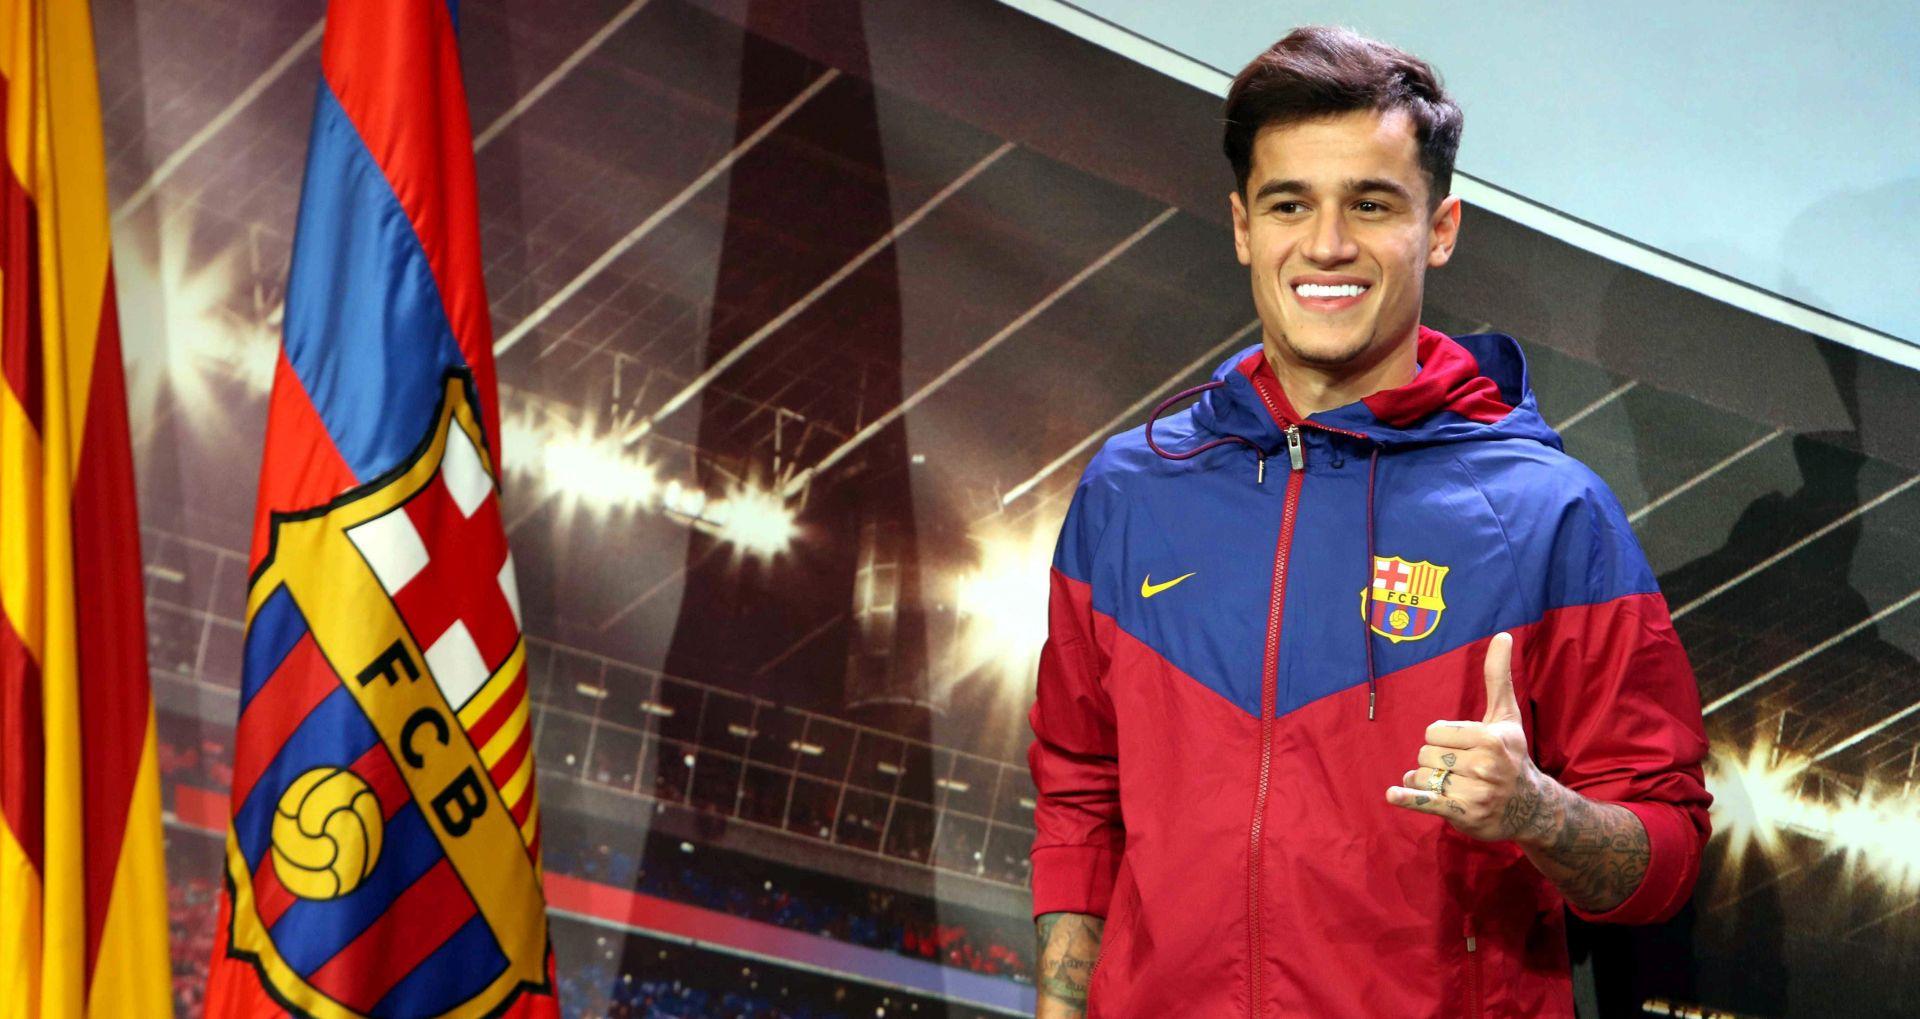 VIDEO: Coutinho i službeno predstavljen, izvan terena tri tjedna